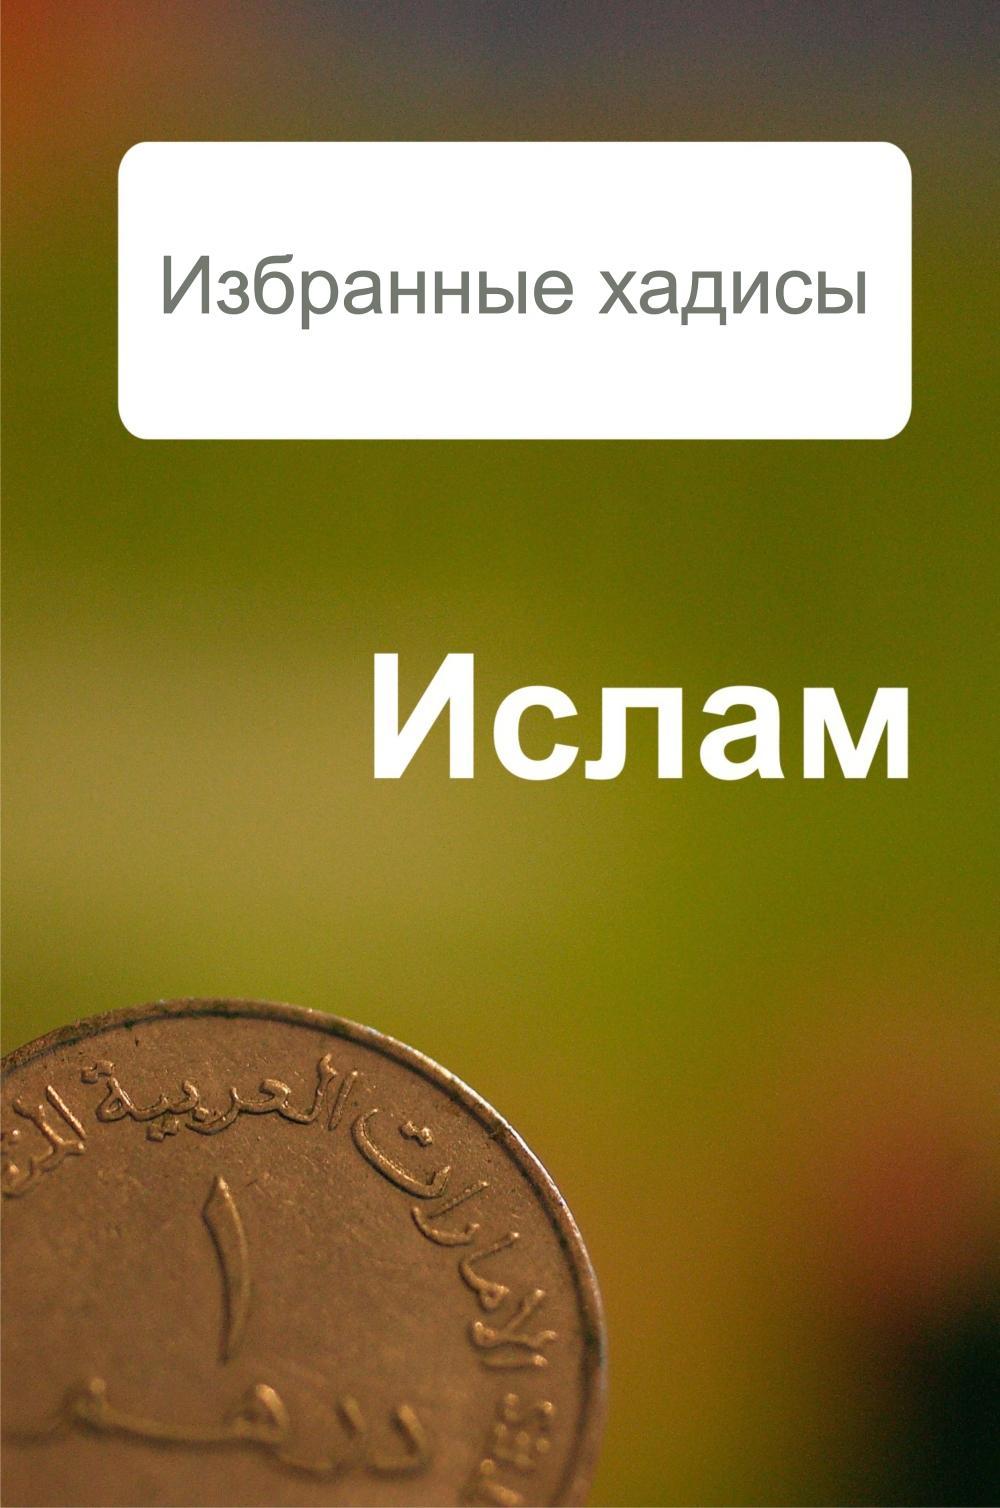 все цены на Александр Ханников Избранные хадисы онлайн